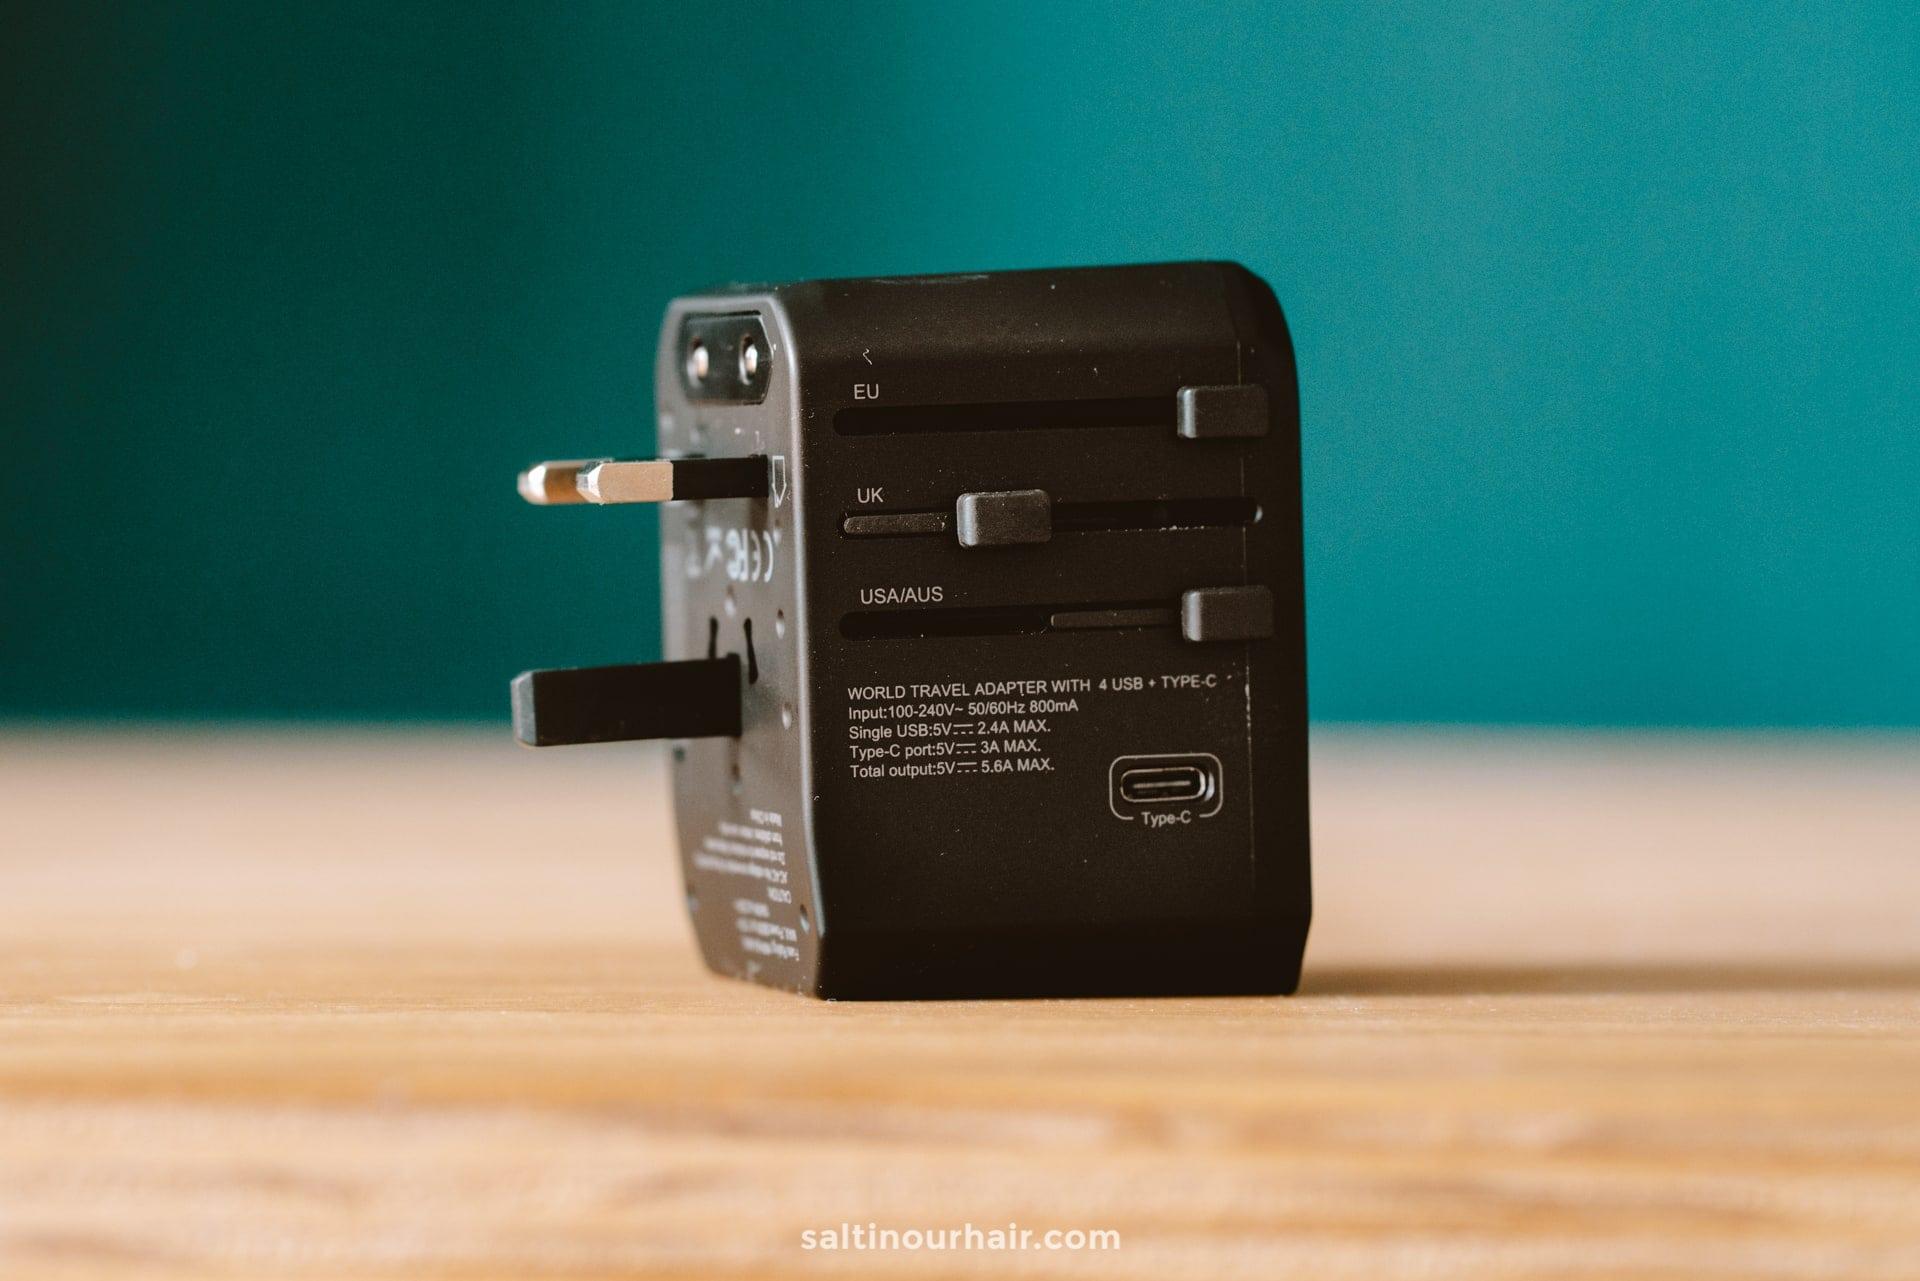 Digital Nomad universal adapter